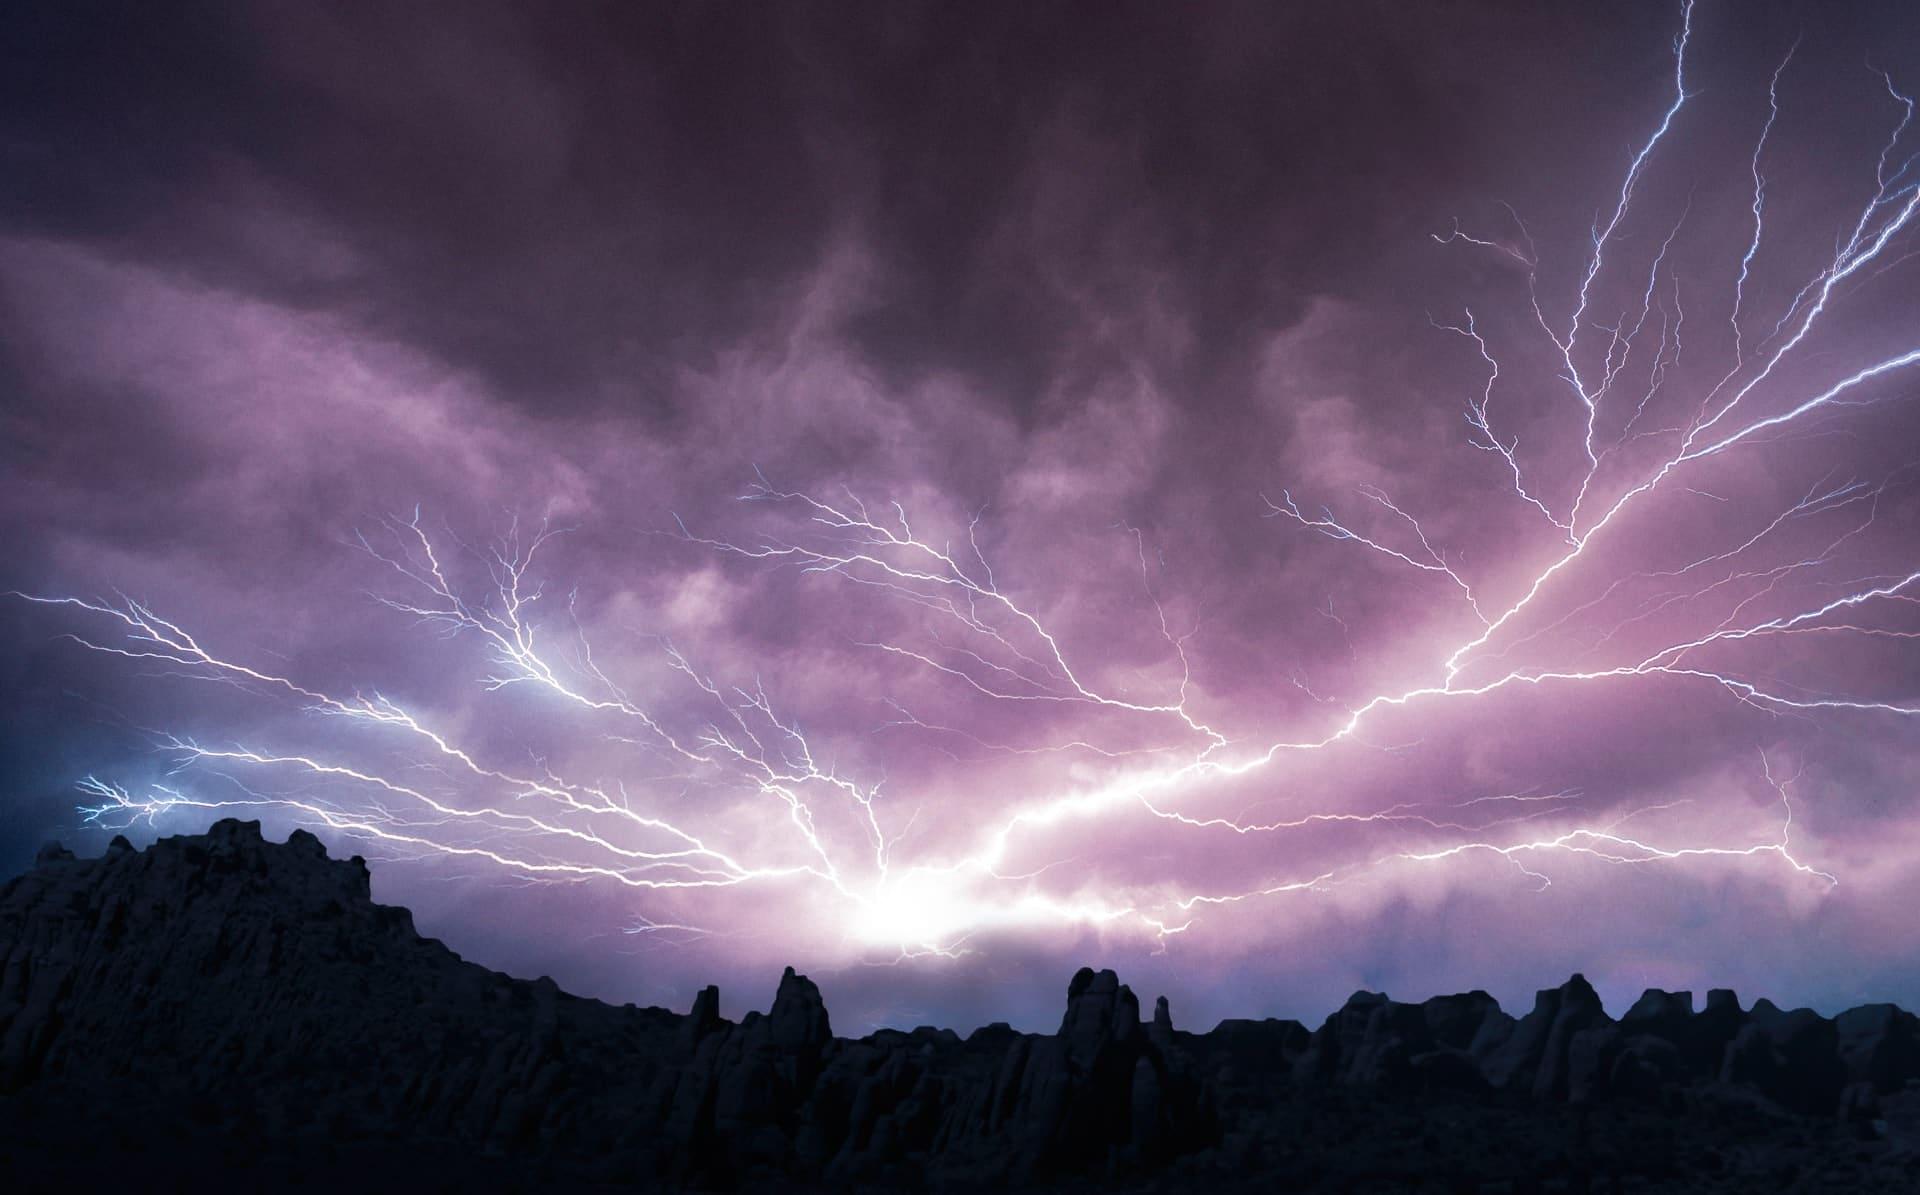 Lightning Network Unsplash